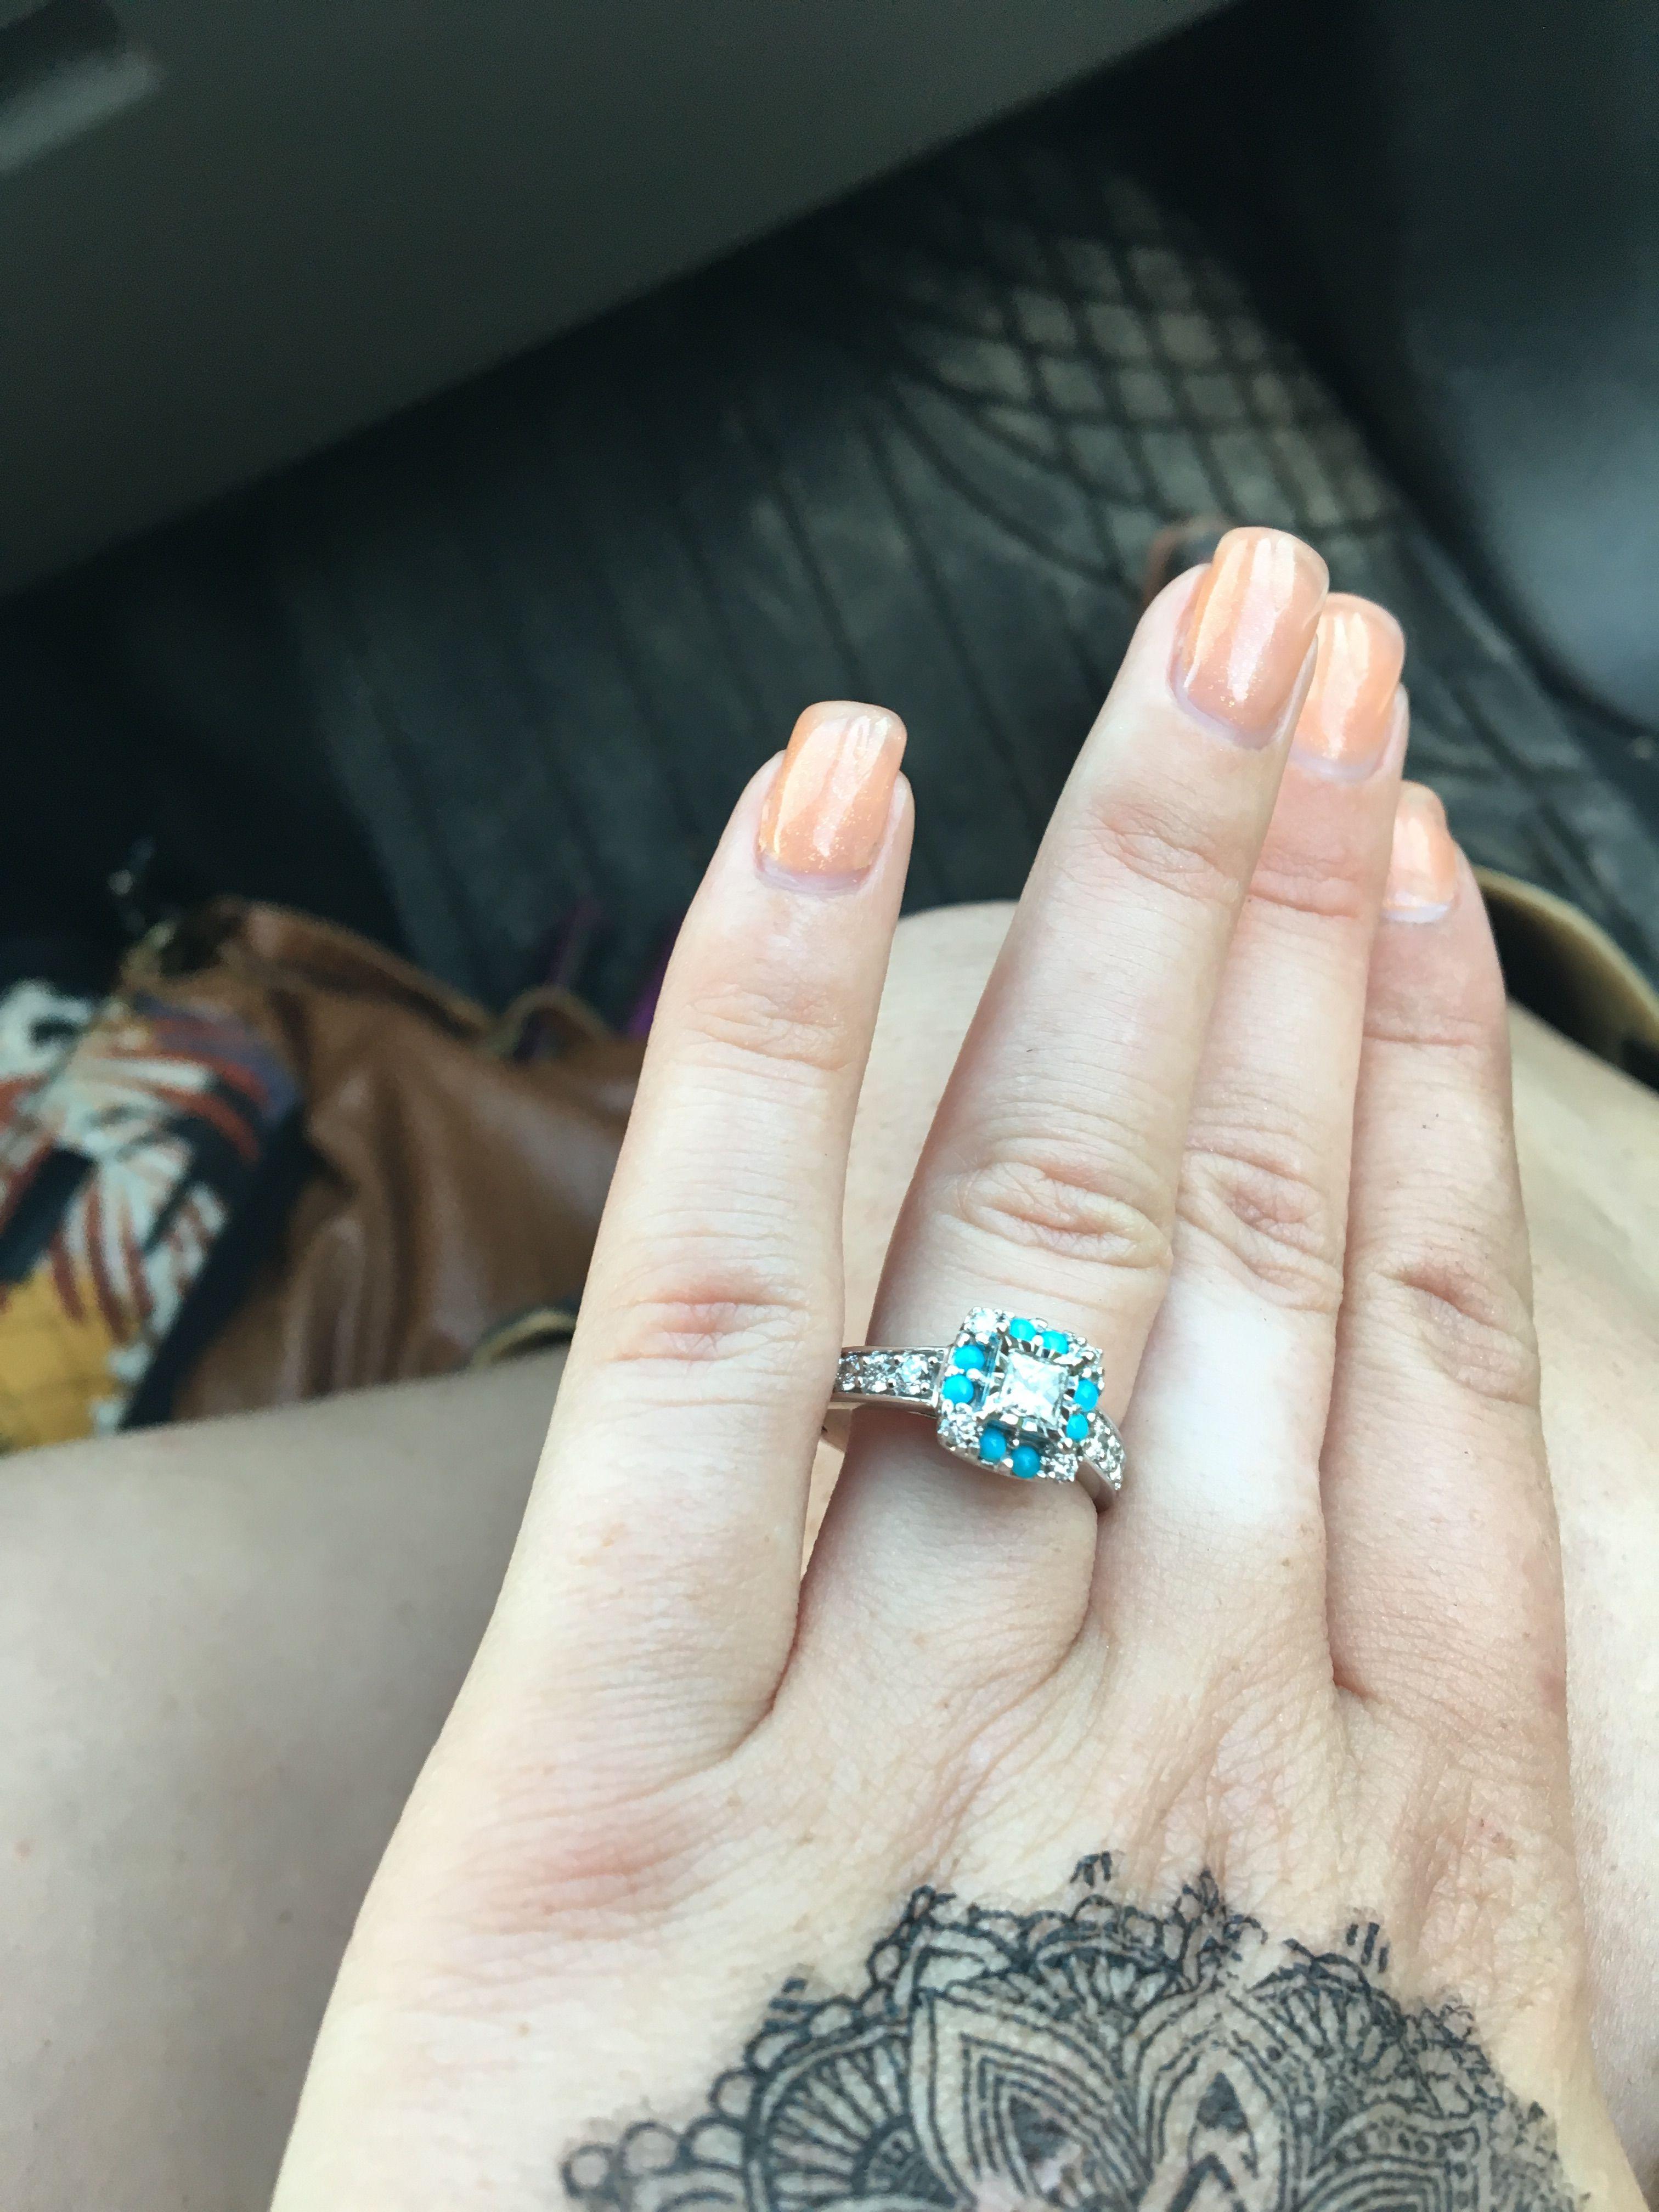 44+ Turquoise wedding rings with diamonds ideas